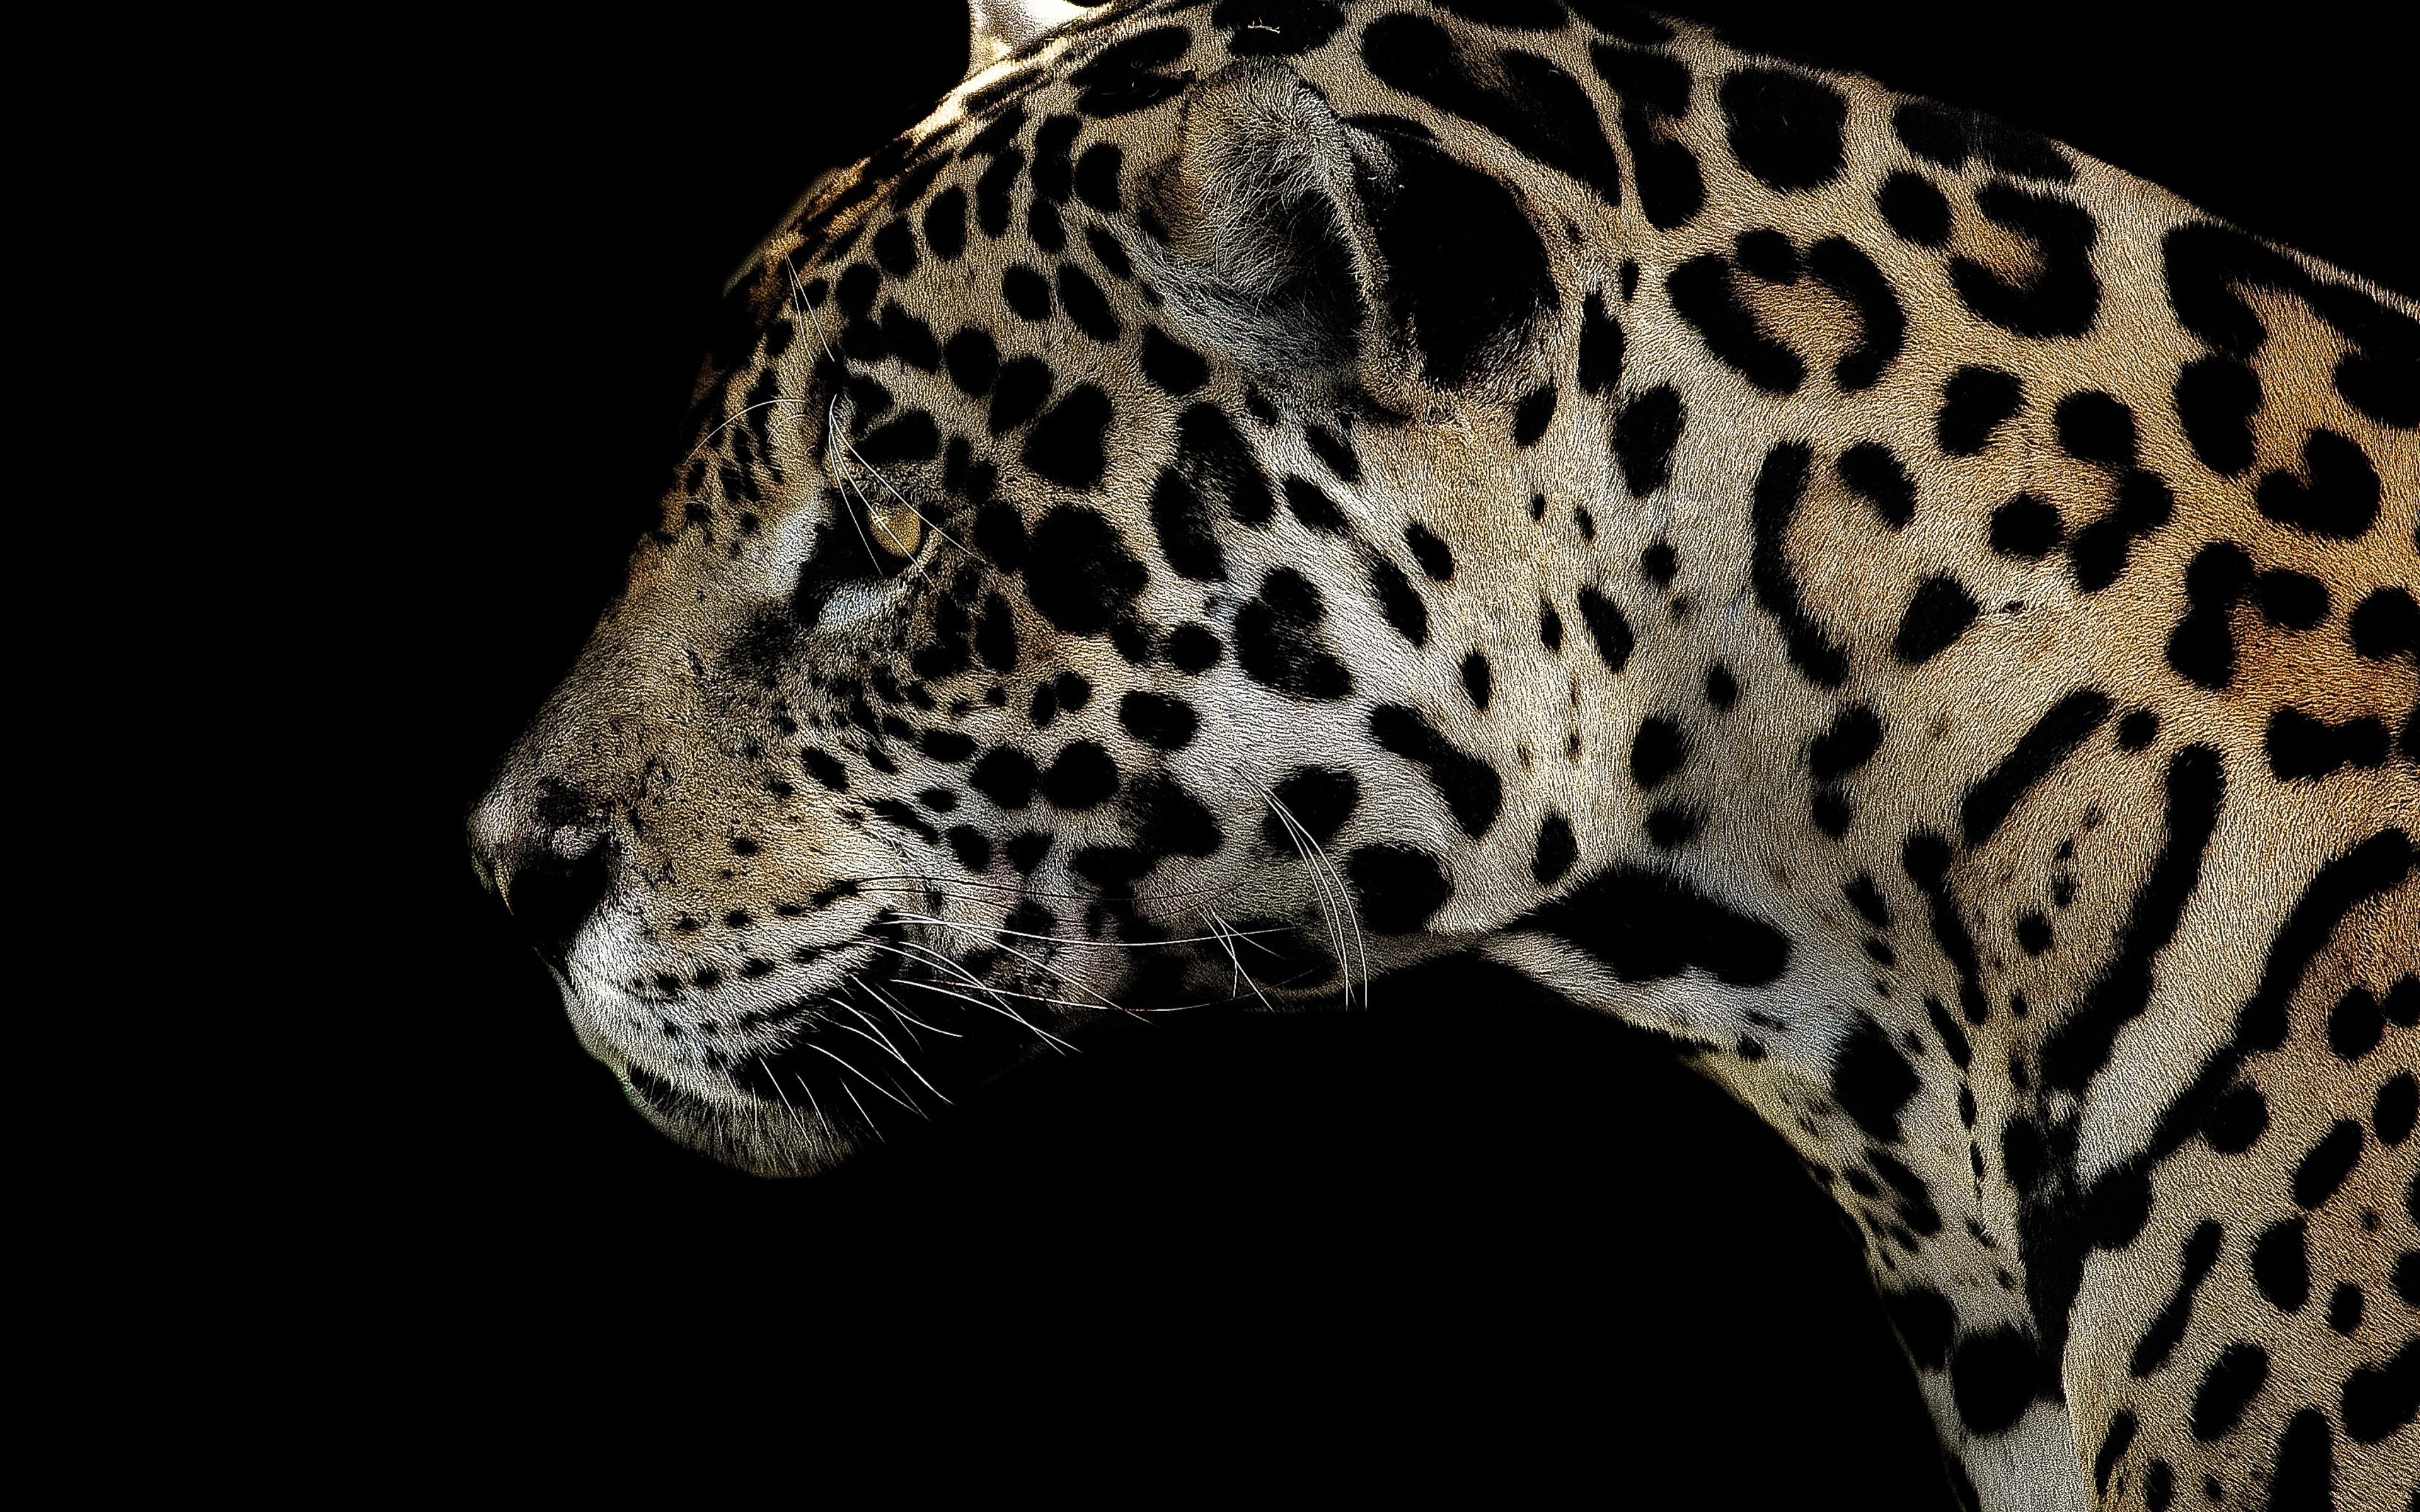 3840x2400 Jaguar Spotted Close 4k 4k HD 4k Wallpapers ...